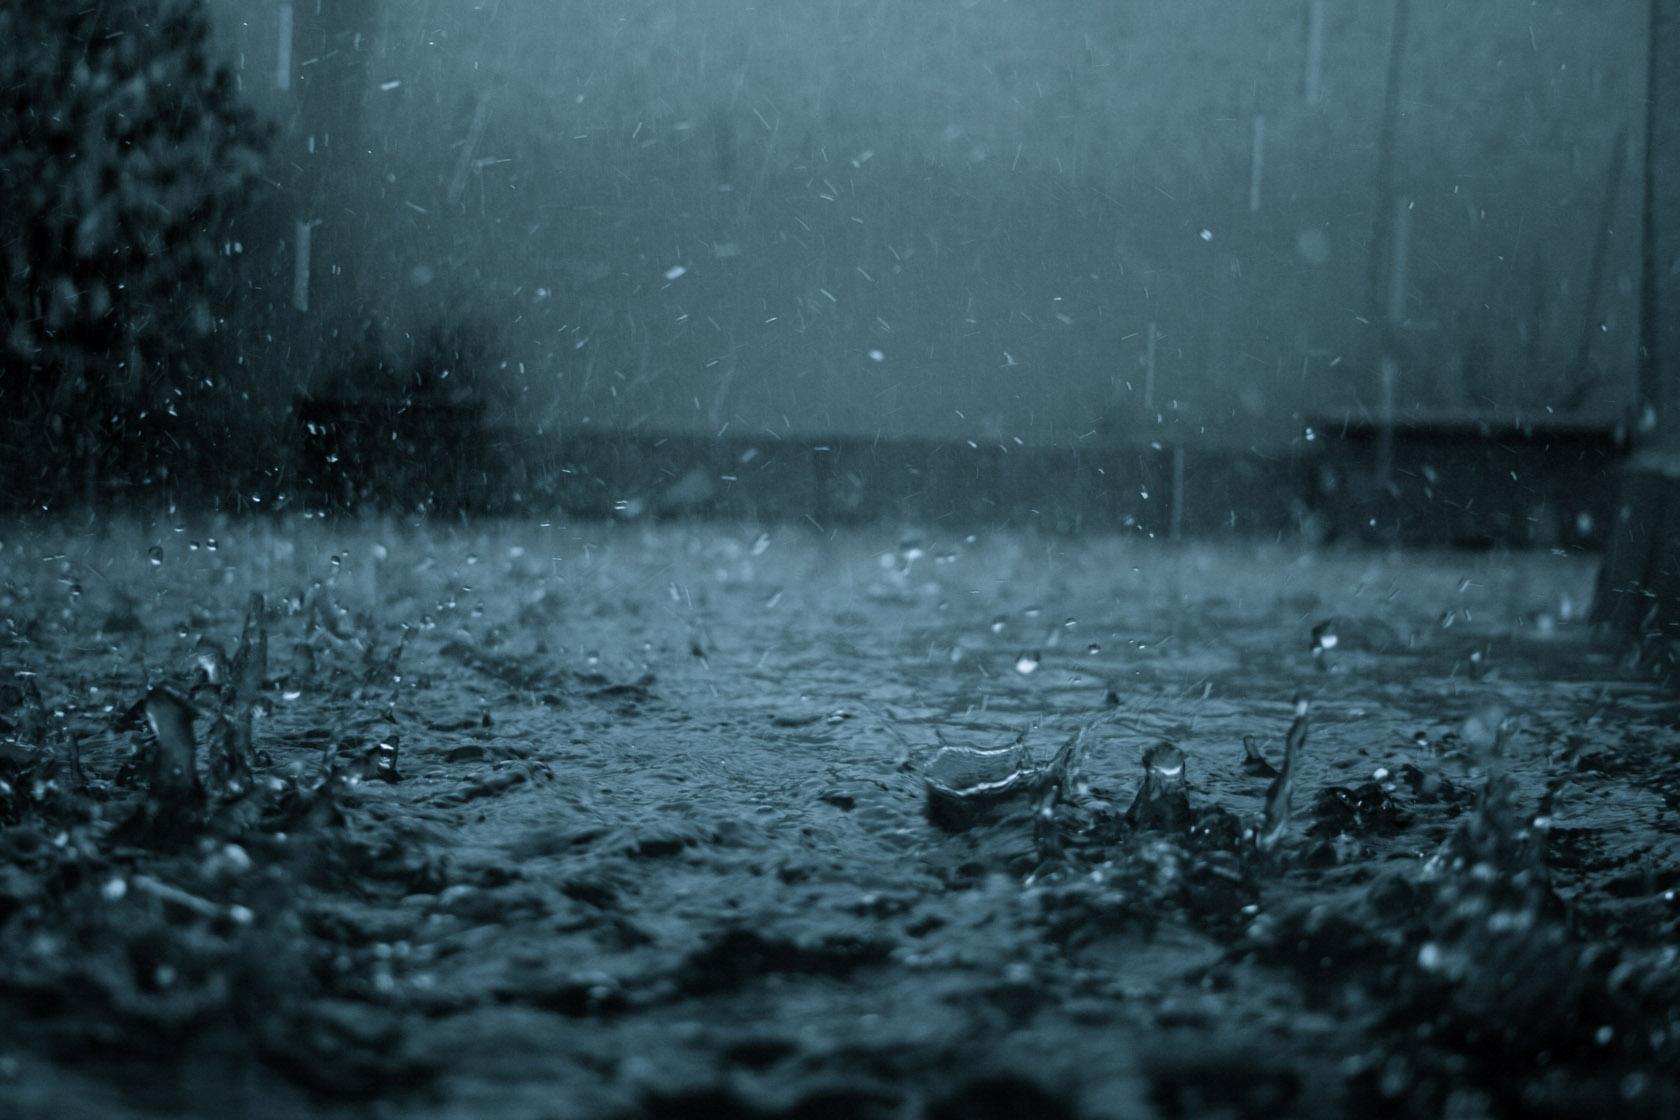 Rains get delayed in India